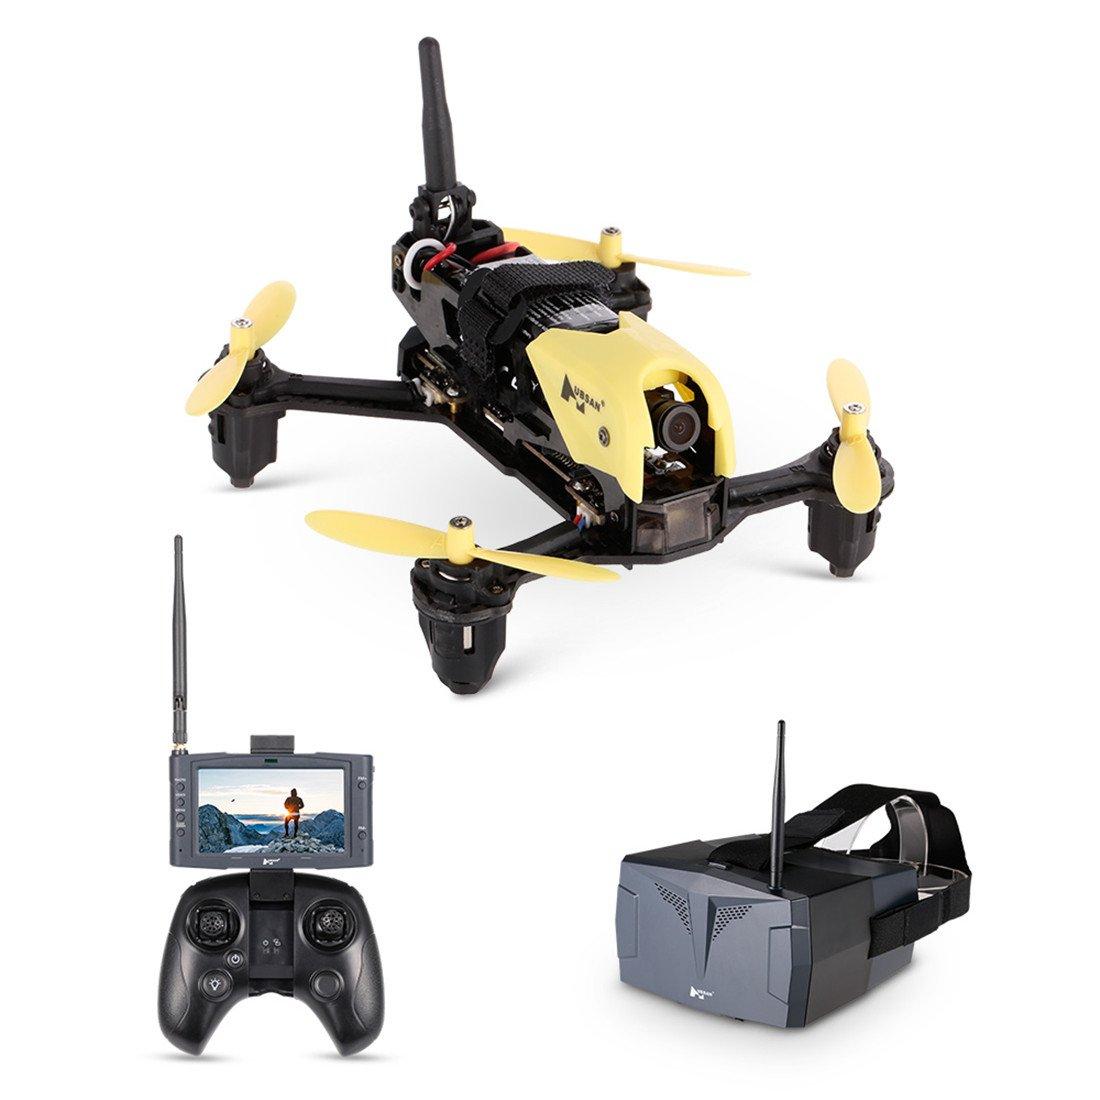 GEHOO GH Hubsan H122D X4 Storm FPV Racing Drone 4CH 3D Roll RTF HD 720P Quadcopter Fotocamera Compatibile con Fatshark Goggles (FPV Goggle Version  con Goggle + LCD Monitor + tra)